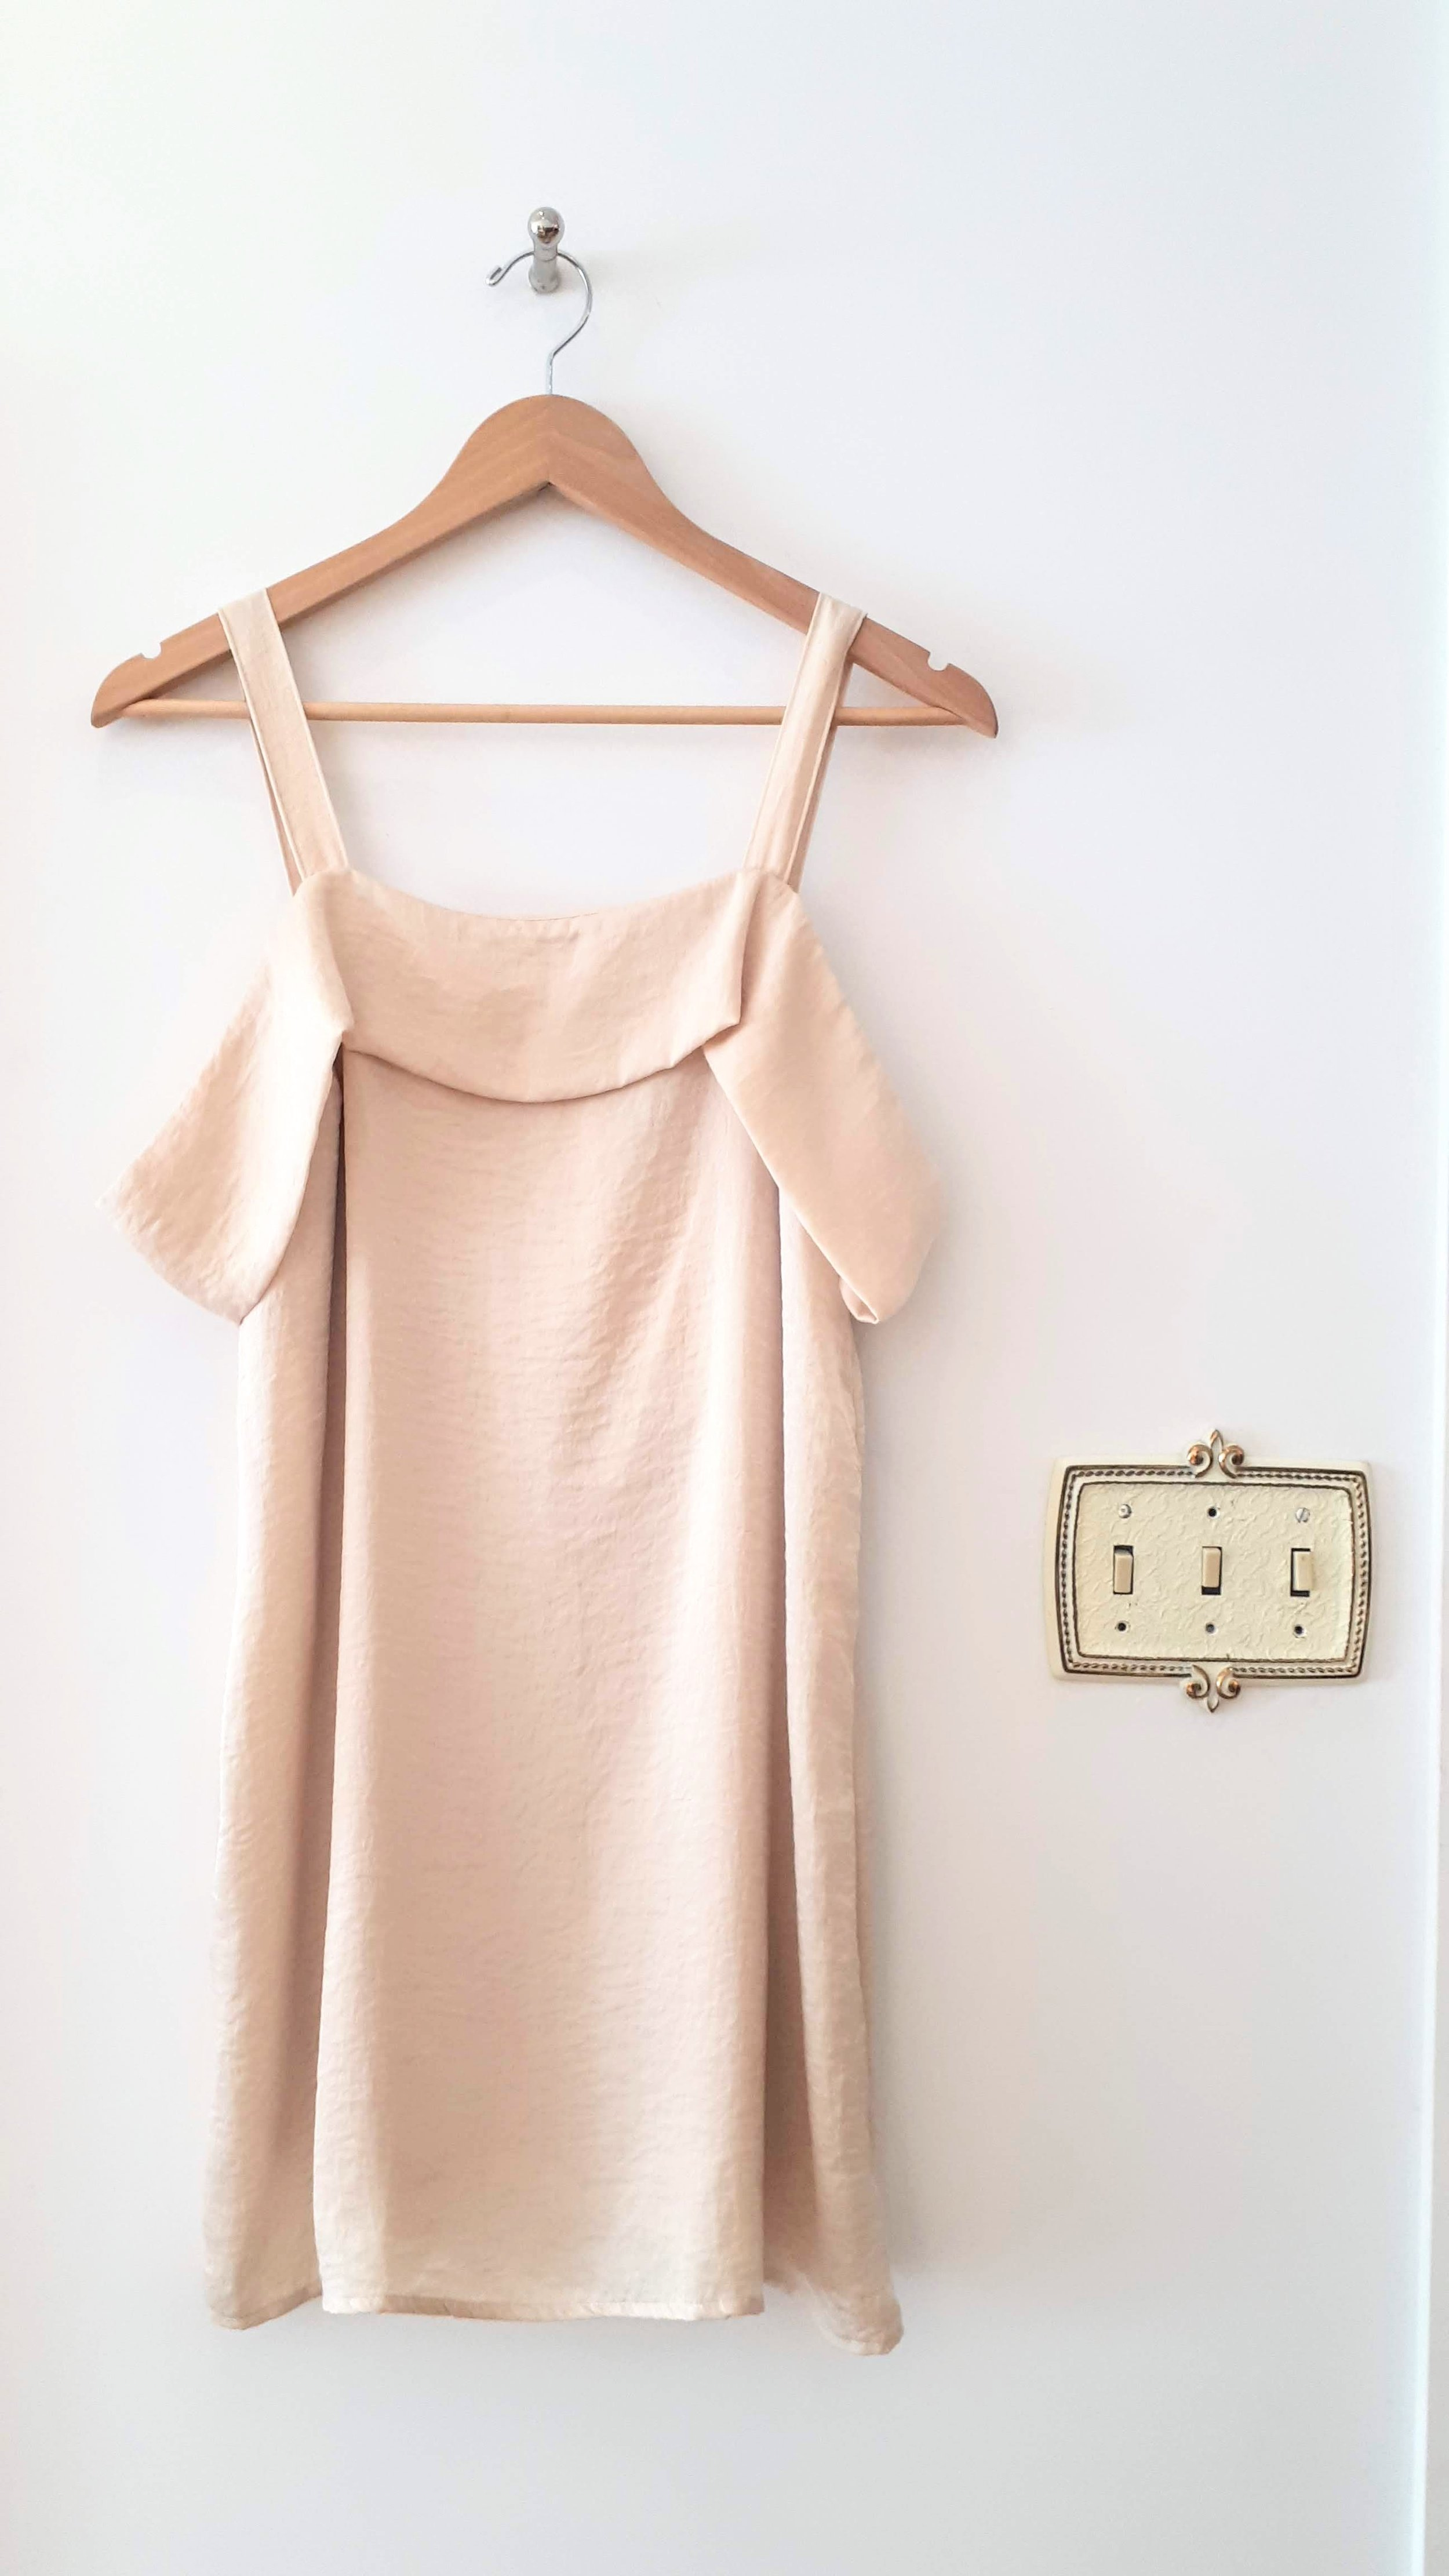 Workhall dress; Size M, $40